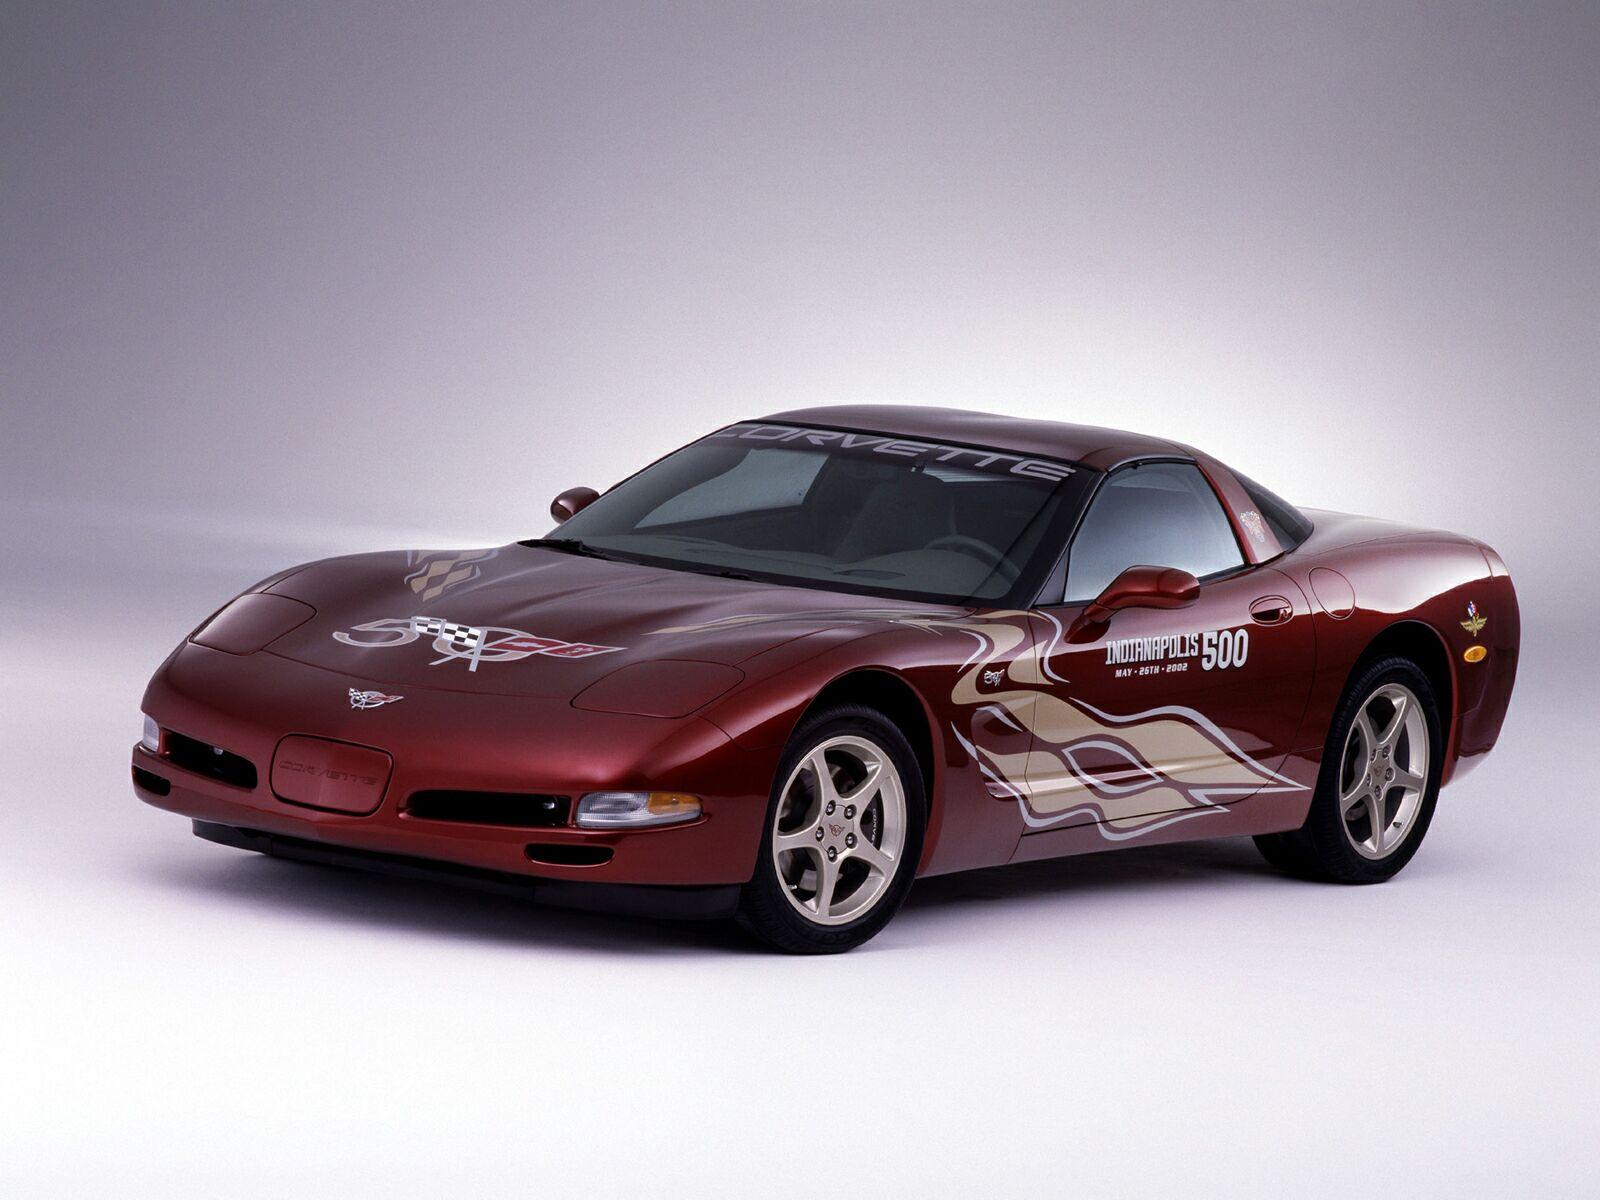 Corvette-anniversary-021-1-